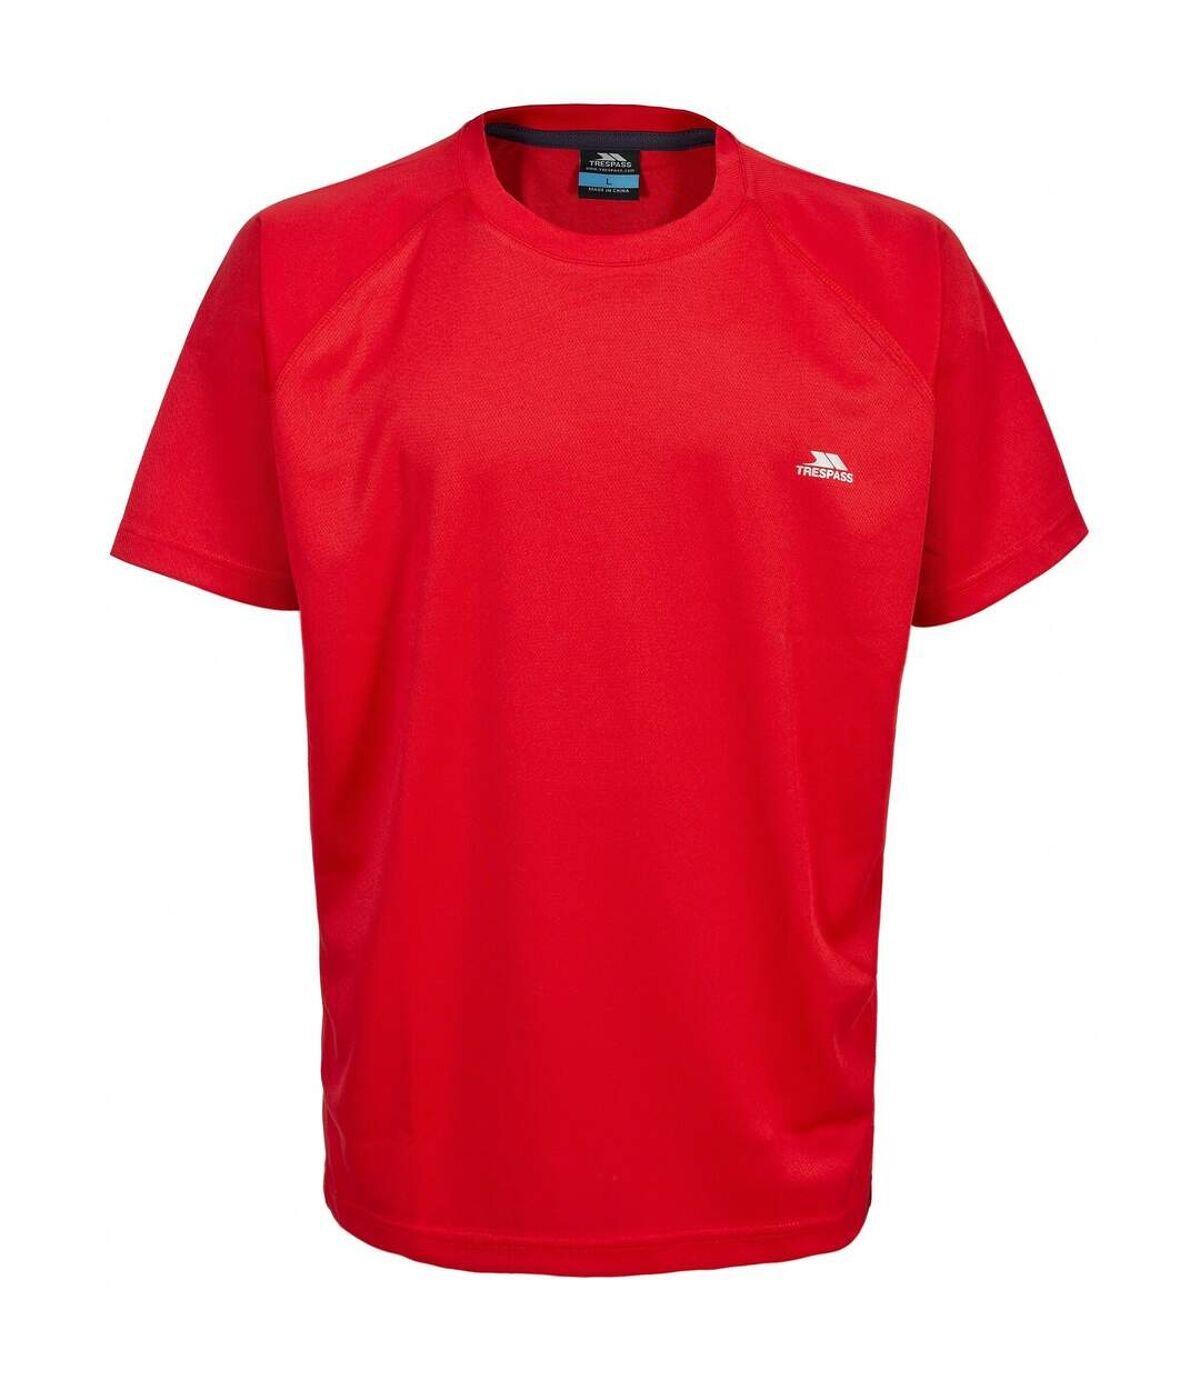 Trespass Mens Debase Short Sleeve Active T-Shirt (Red) - UTTP2922